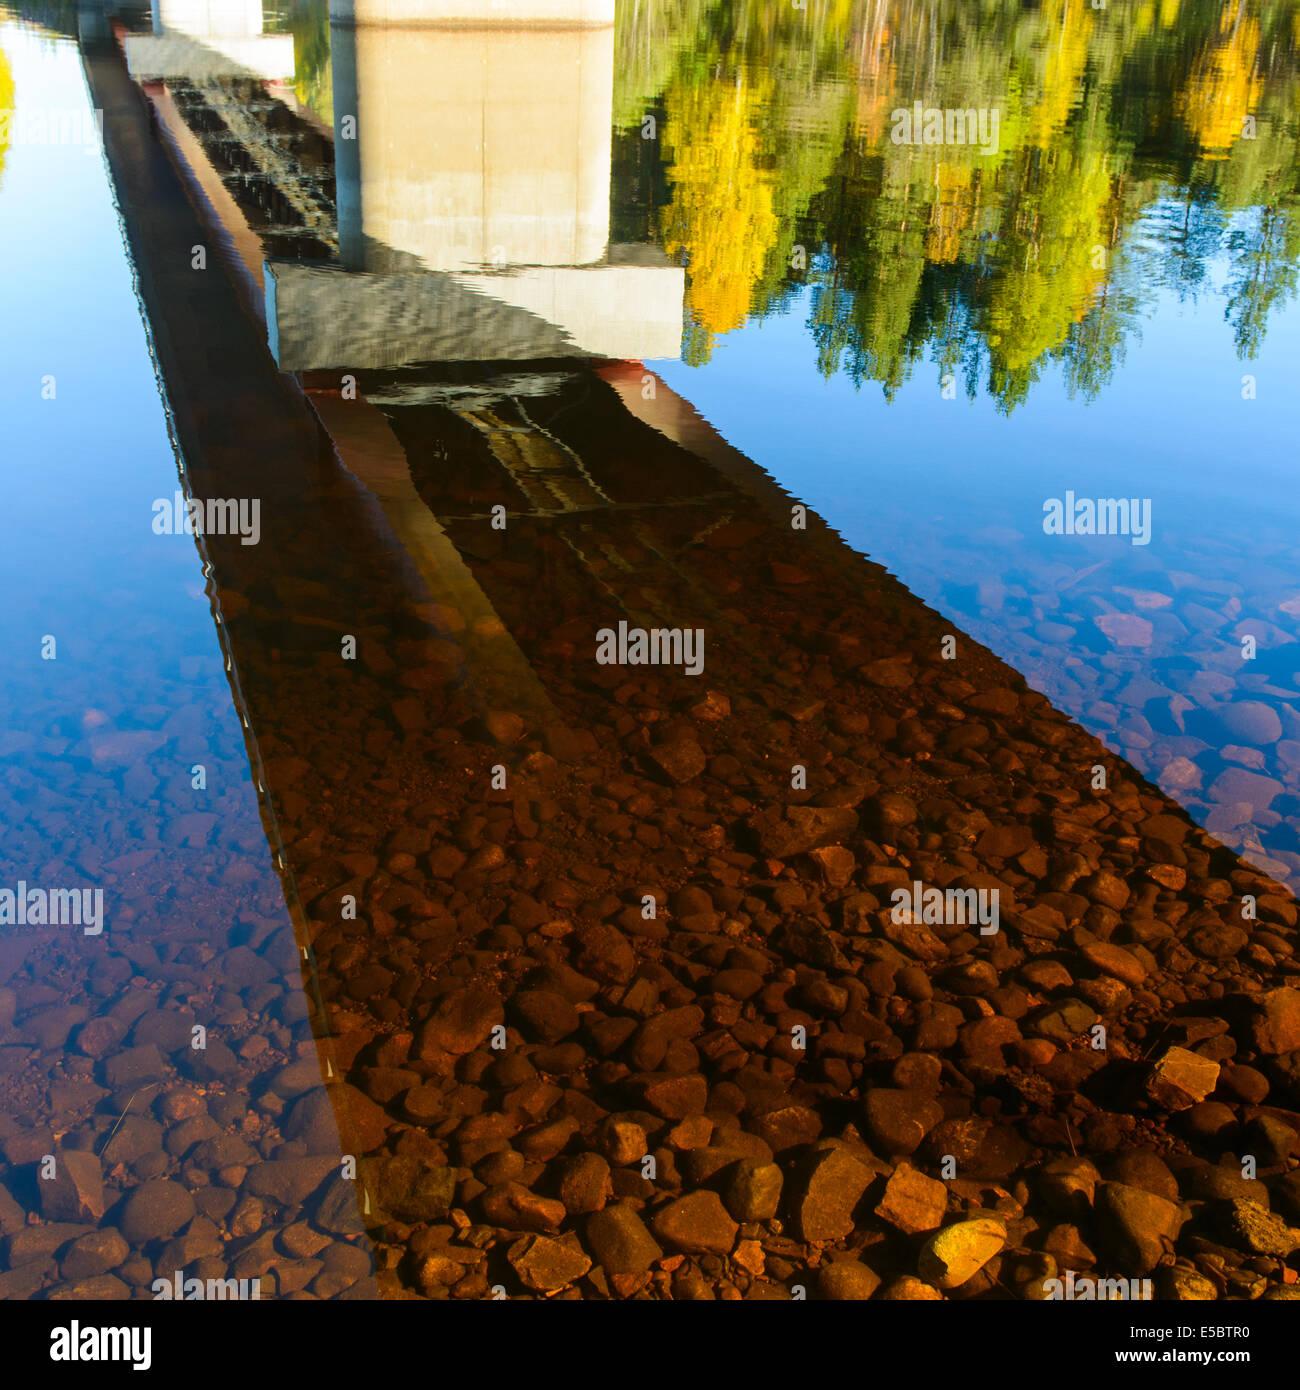 Reflection of road bridge on river, Sweden - Stock Image